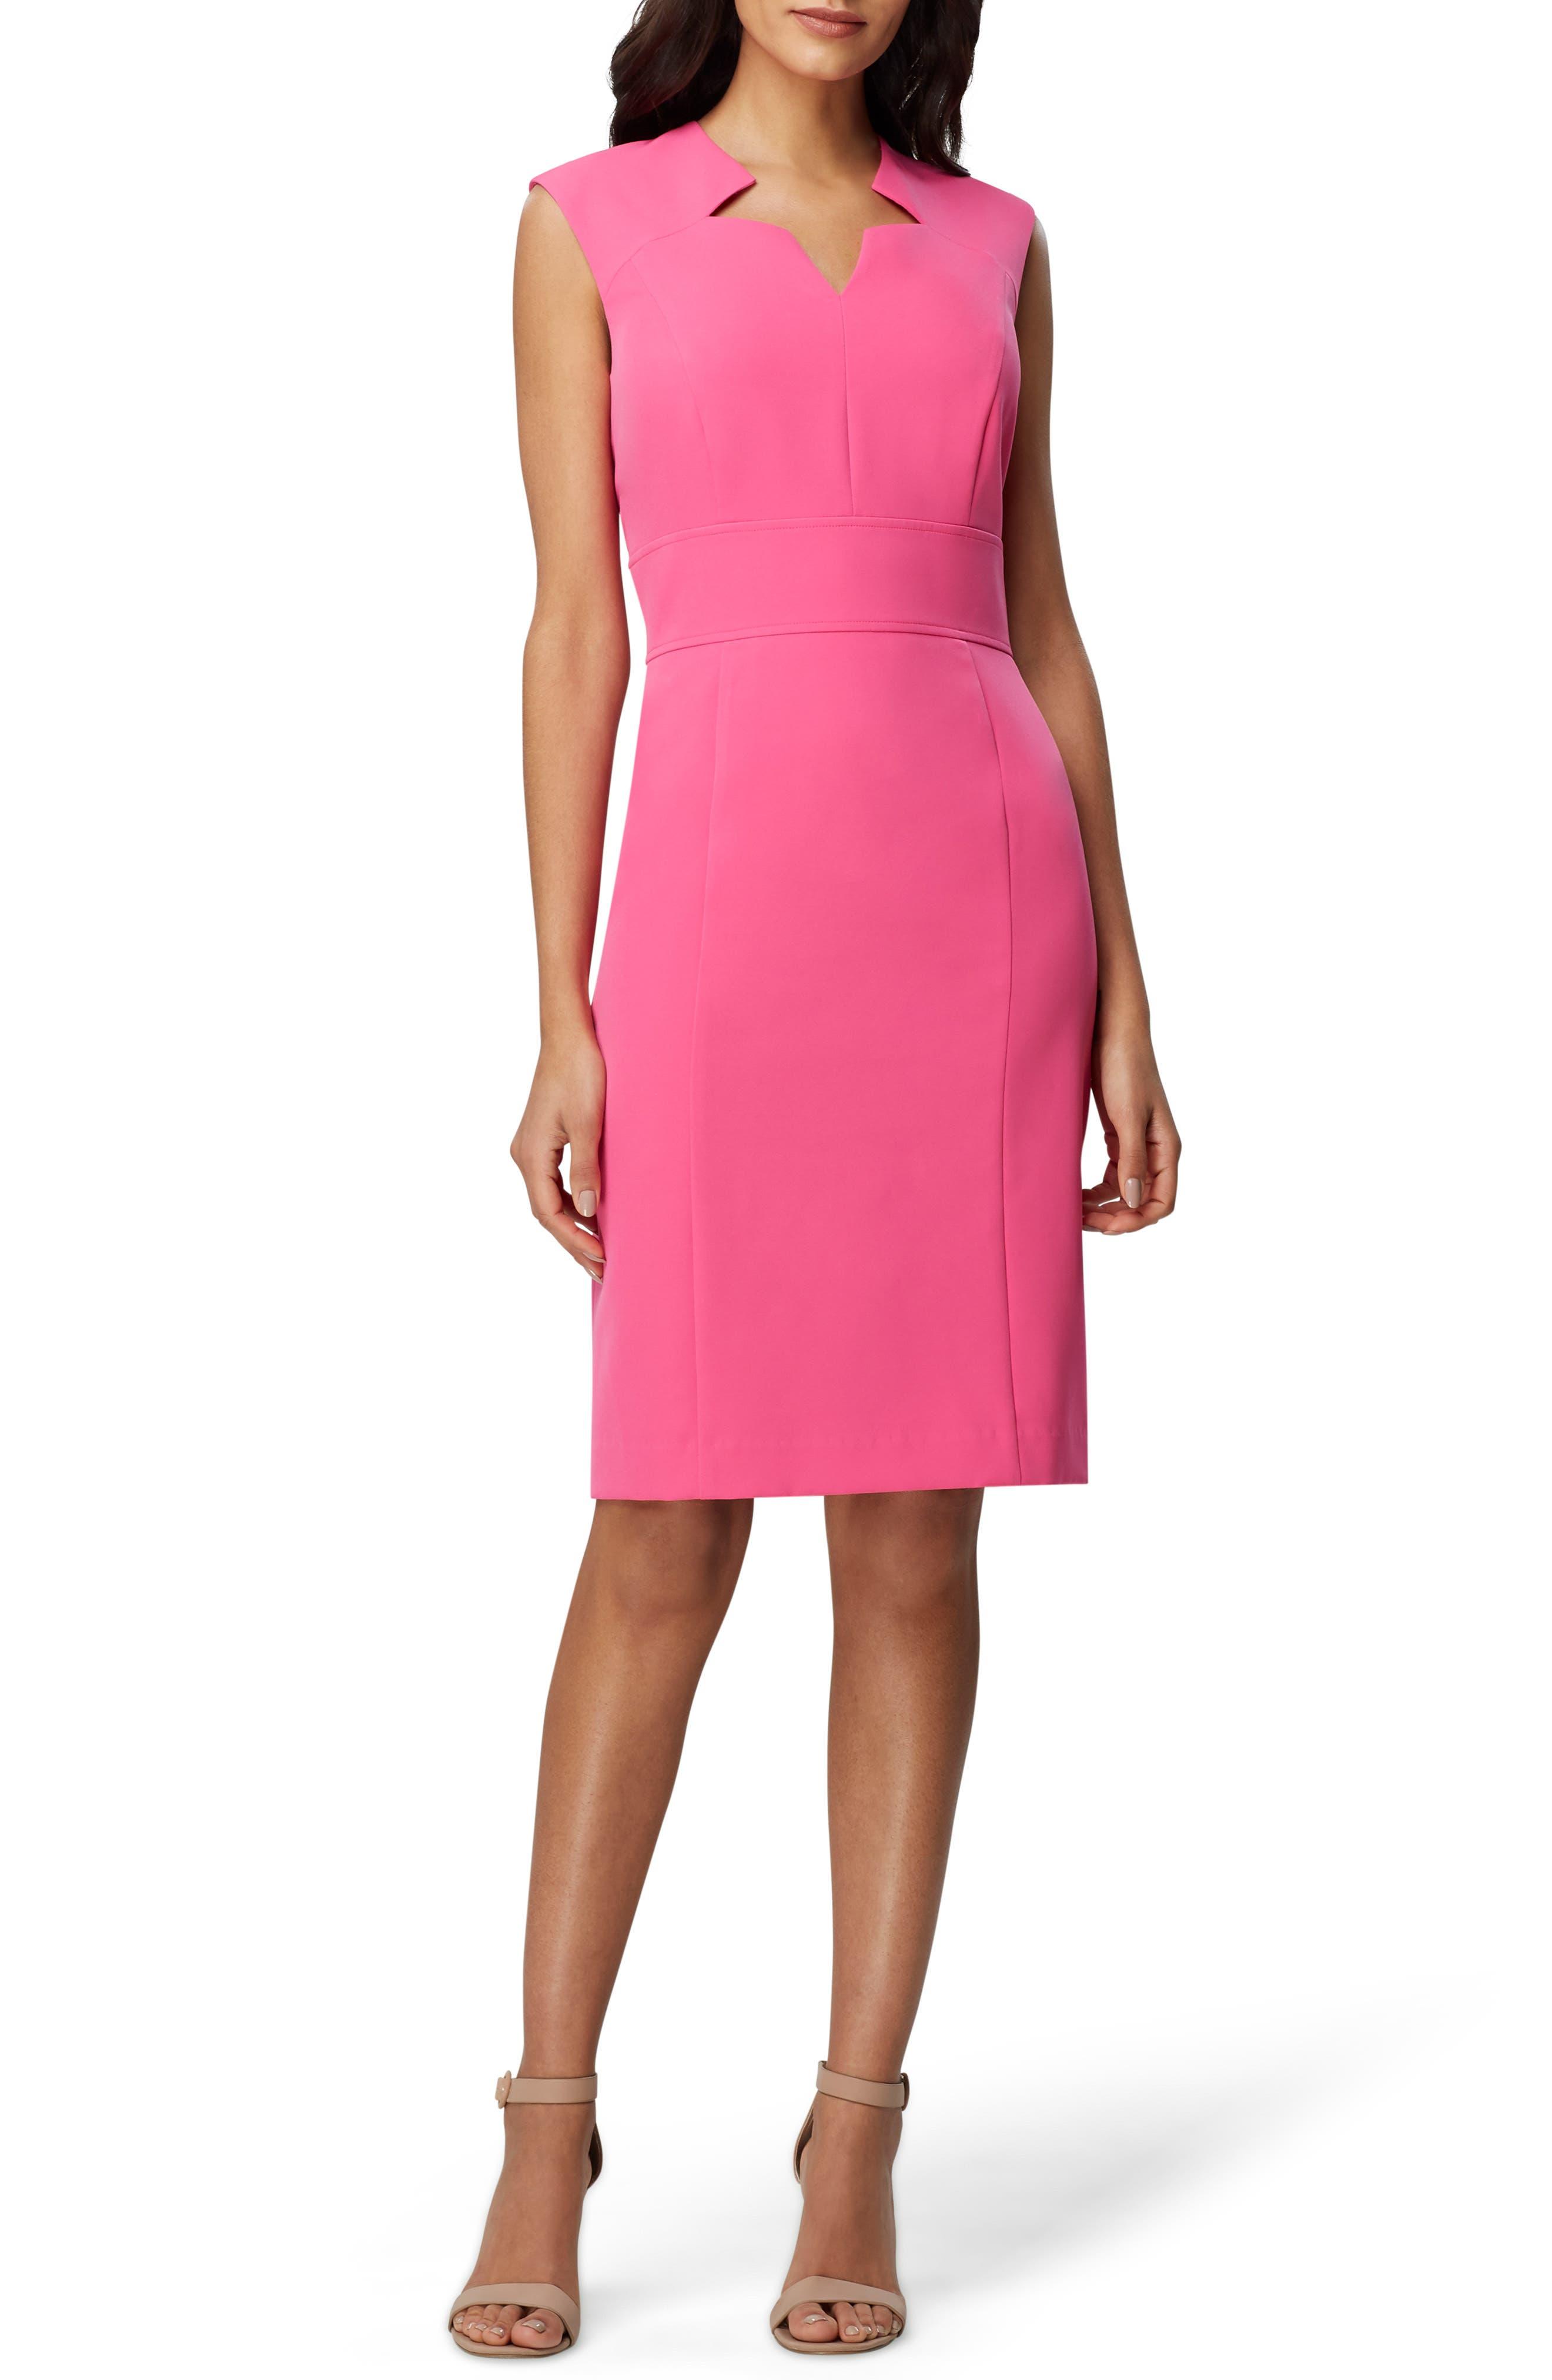 Tahari Crepe Star Sheath Dress, Pink